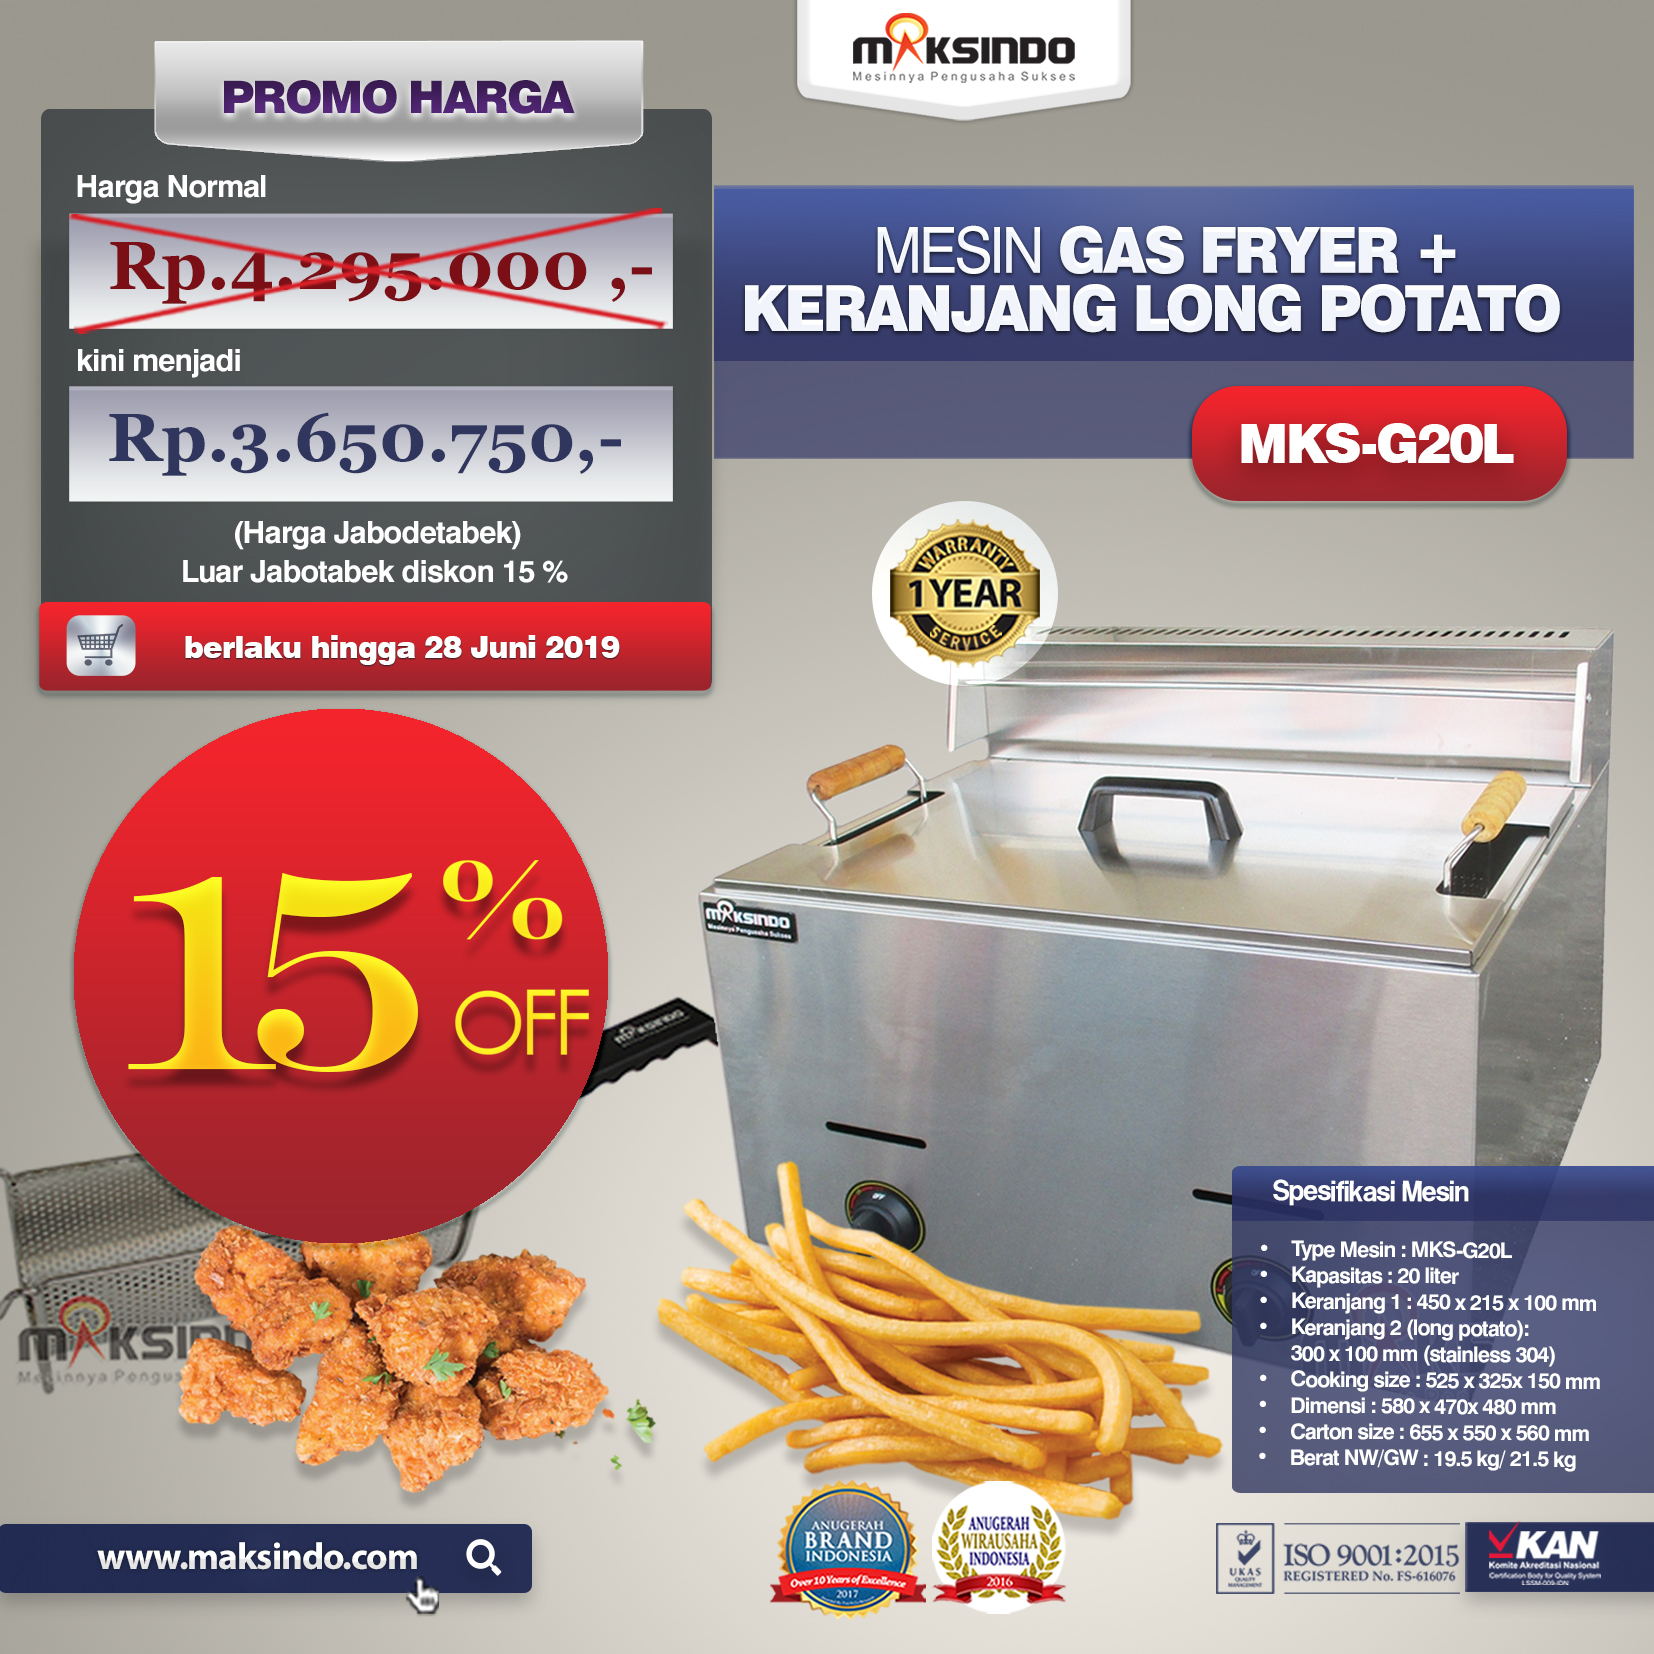 MKS-G20 L Mesin Gas Fryer +Keranjang Long Potato